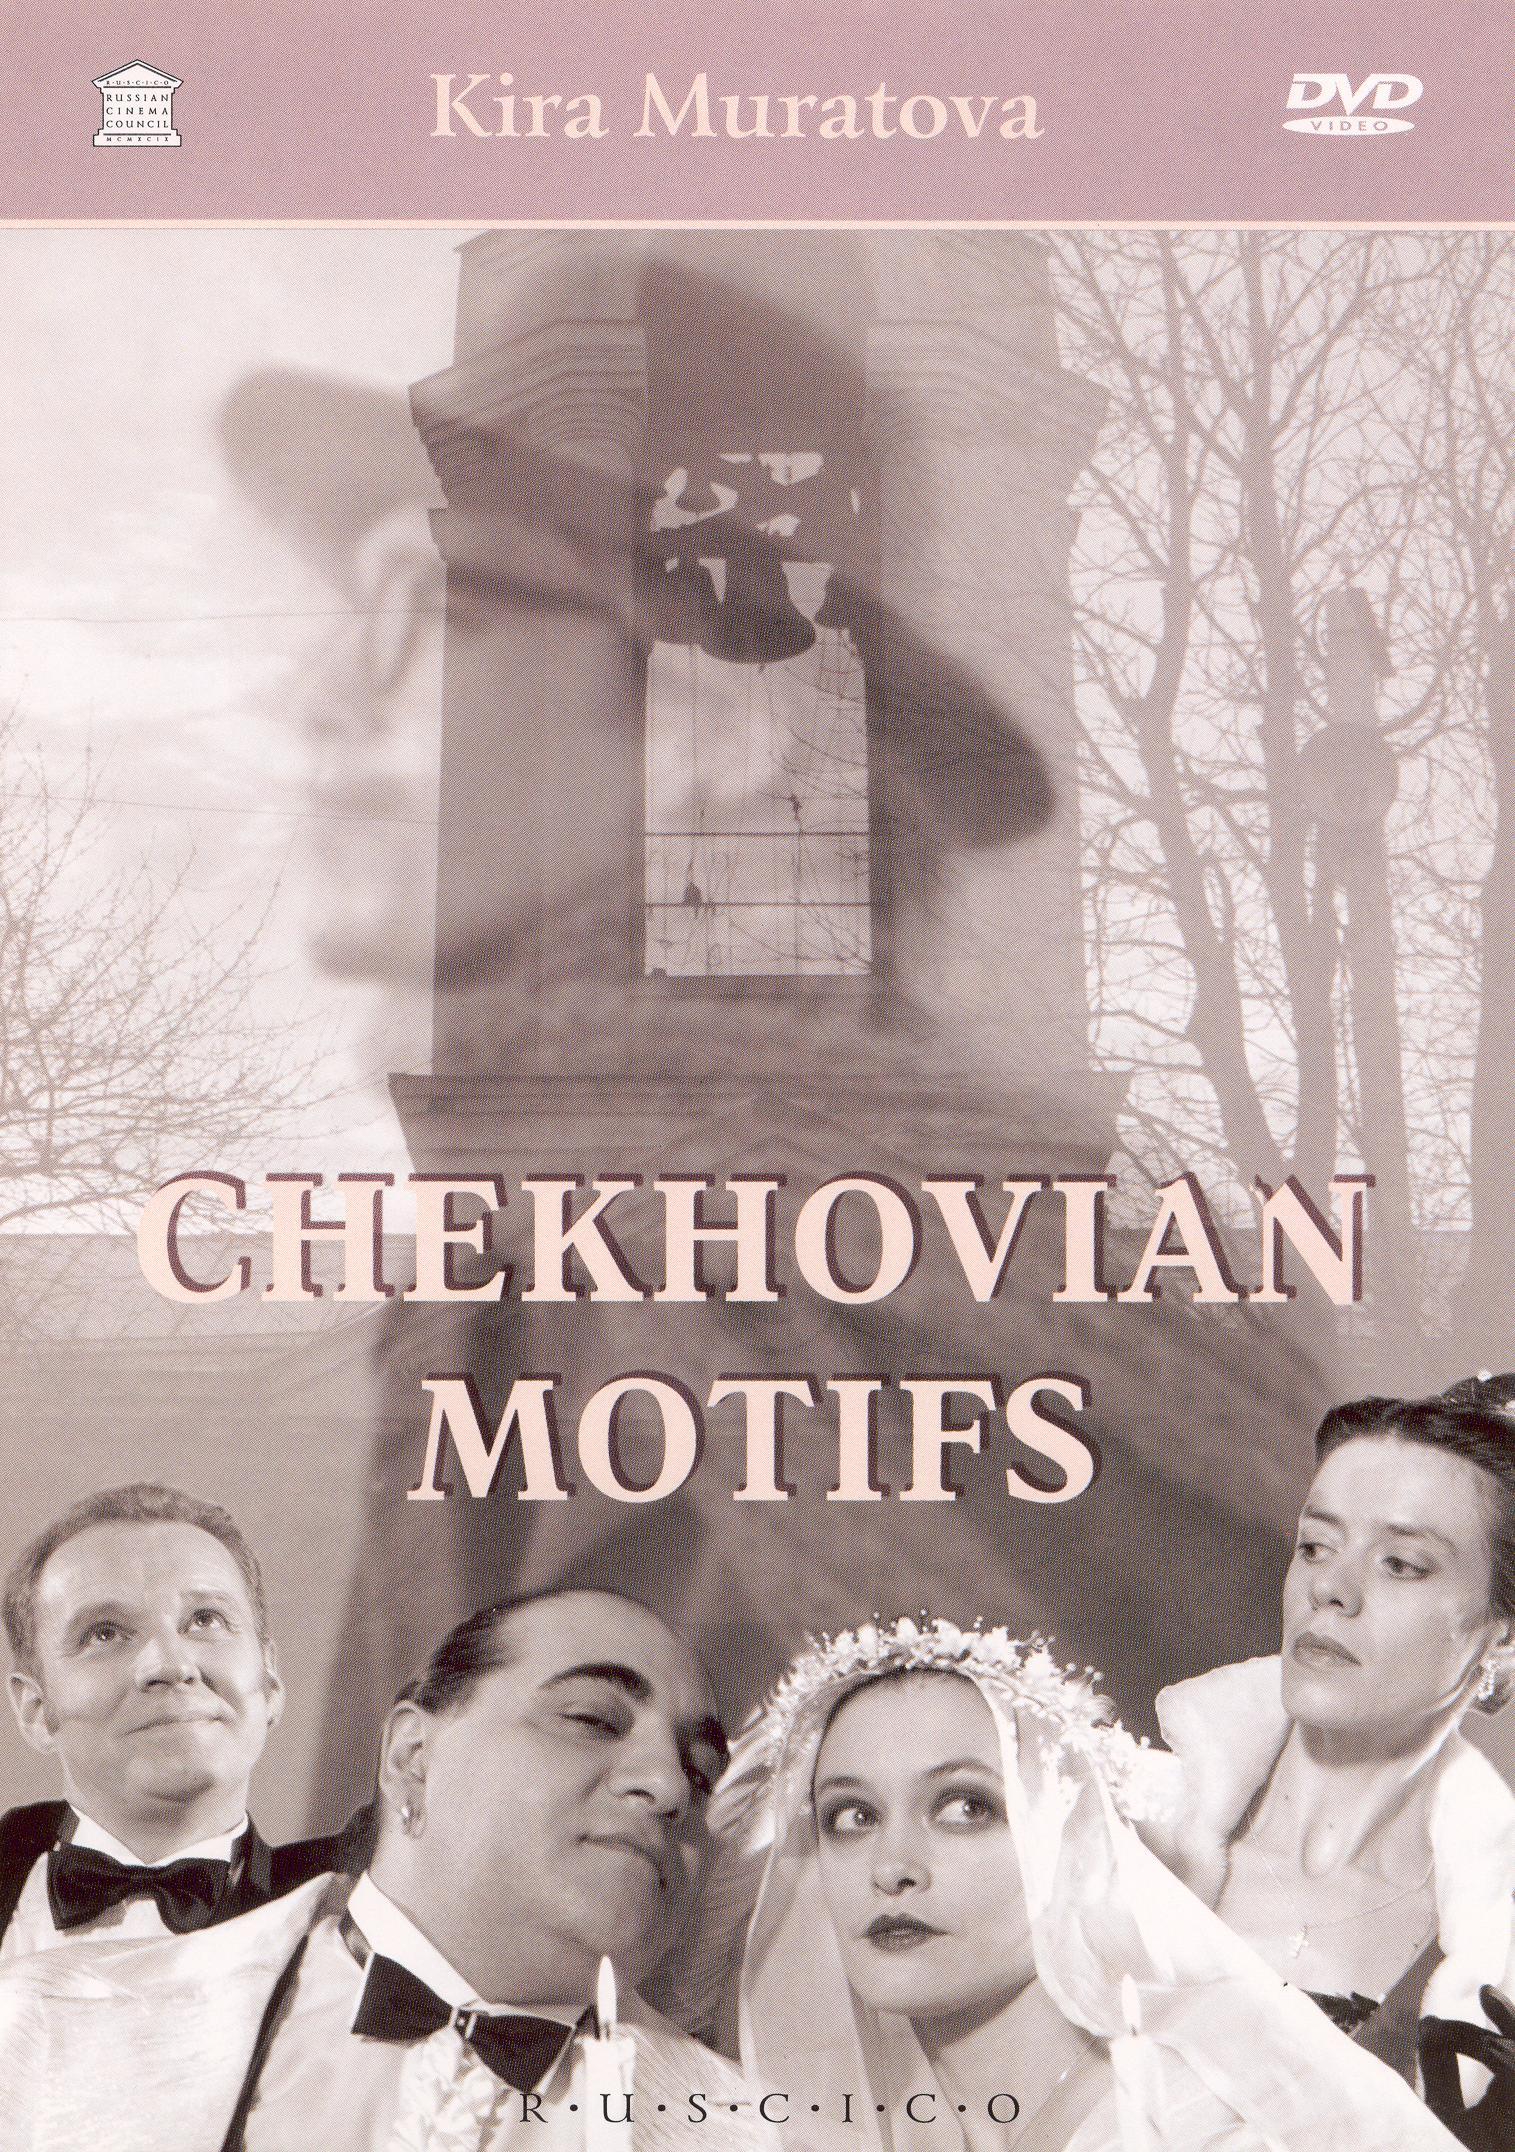 Checkhovian Motifs